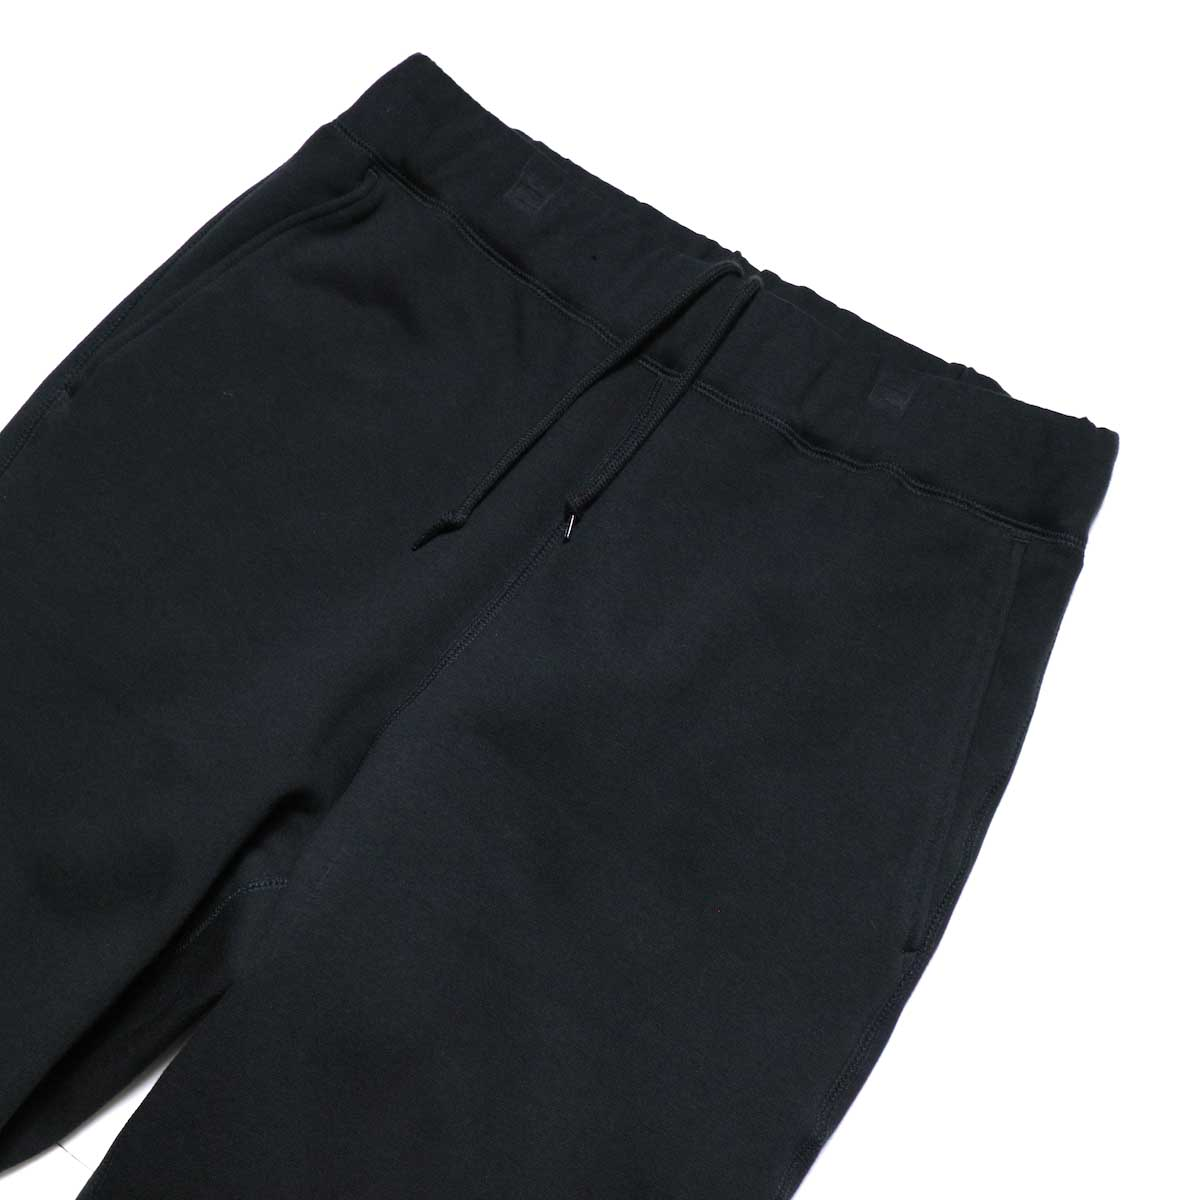 N.HOOLYWOOD / 27RCH-013 Track Pants (Black)ウエスト